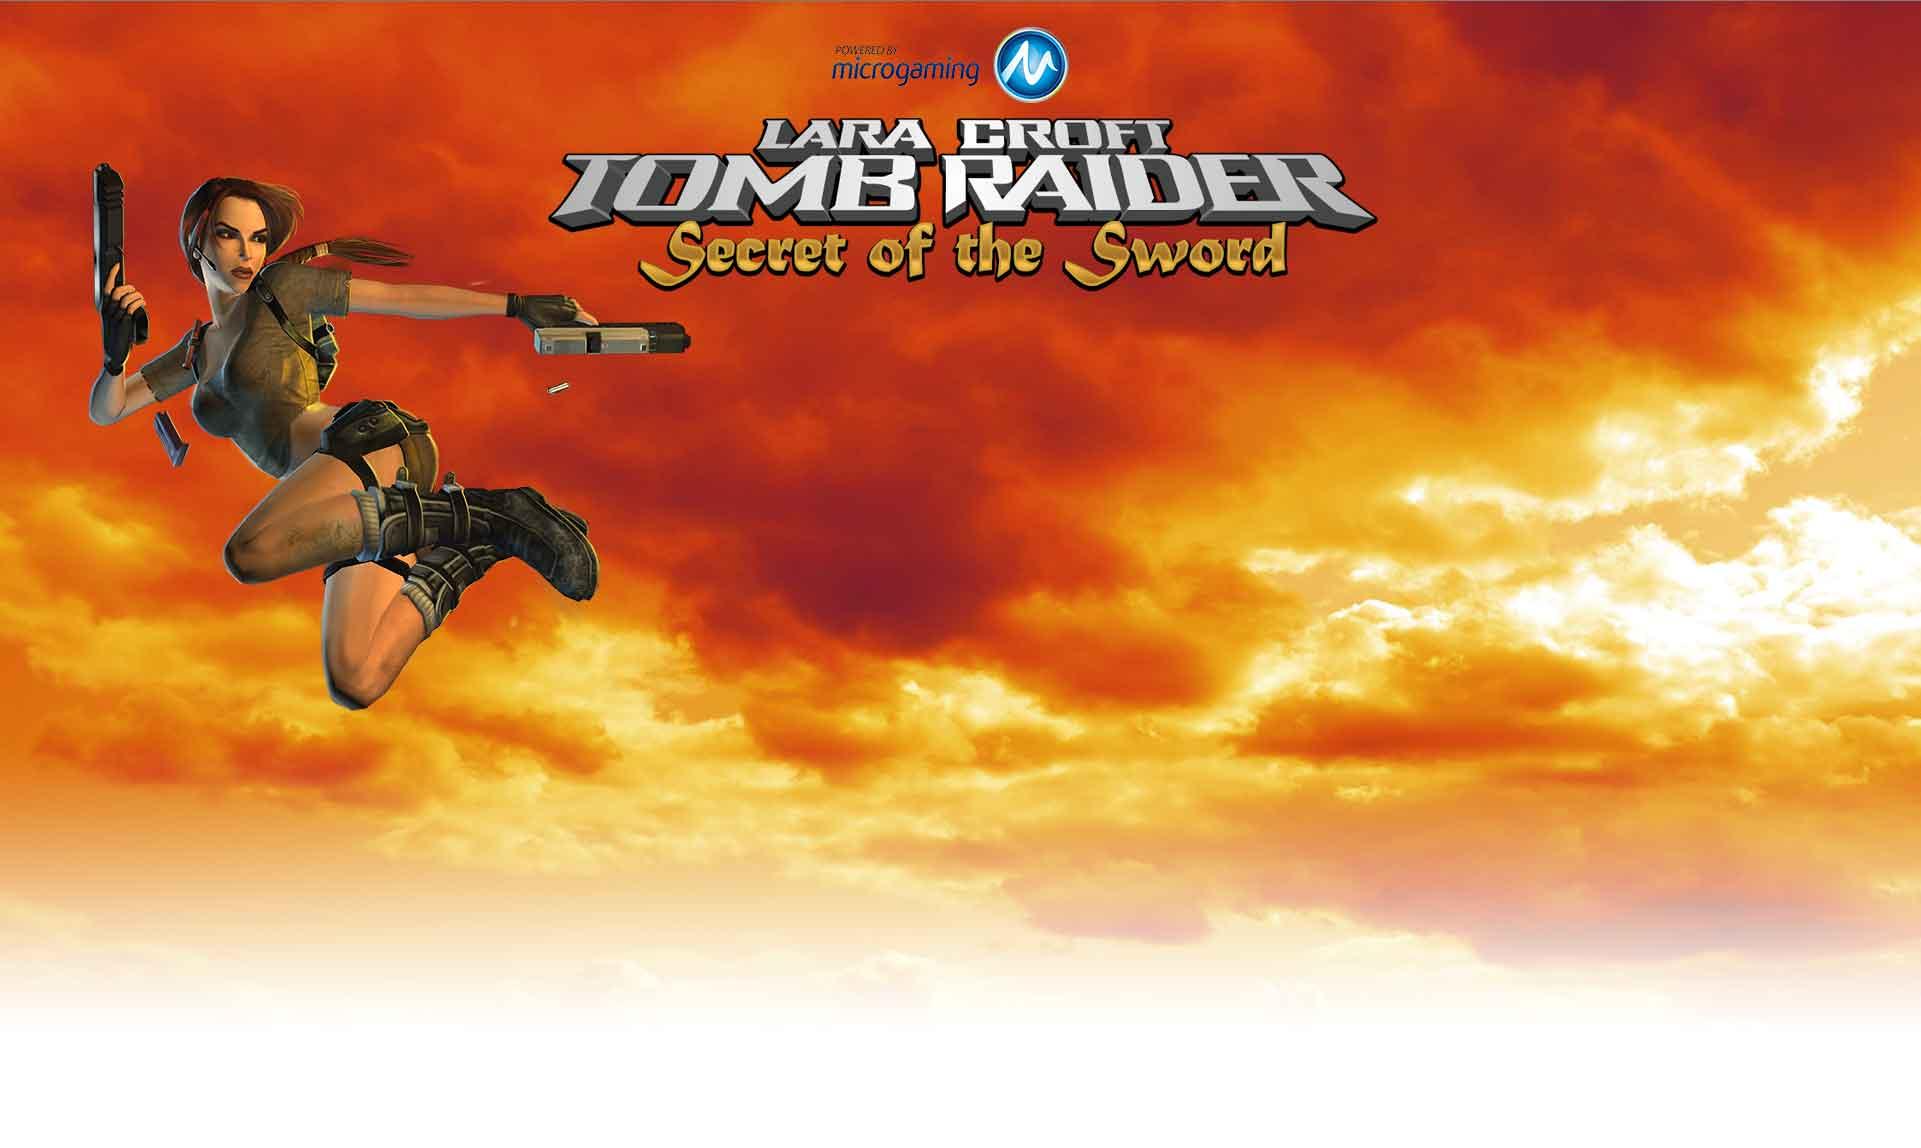 tomb-raider-secret-of-the-sword